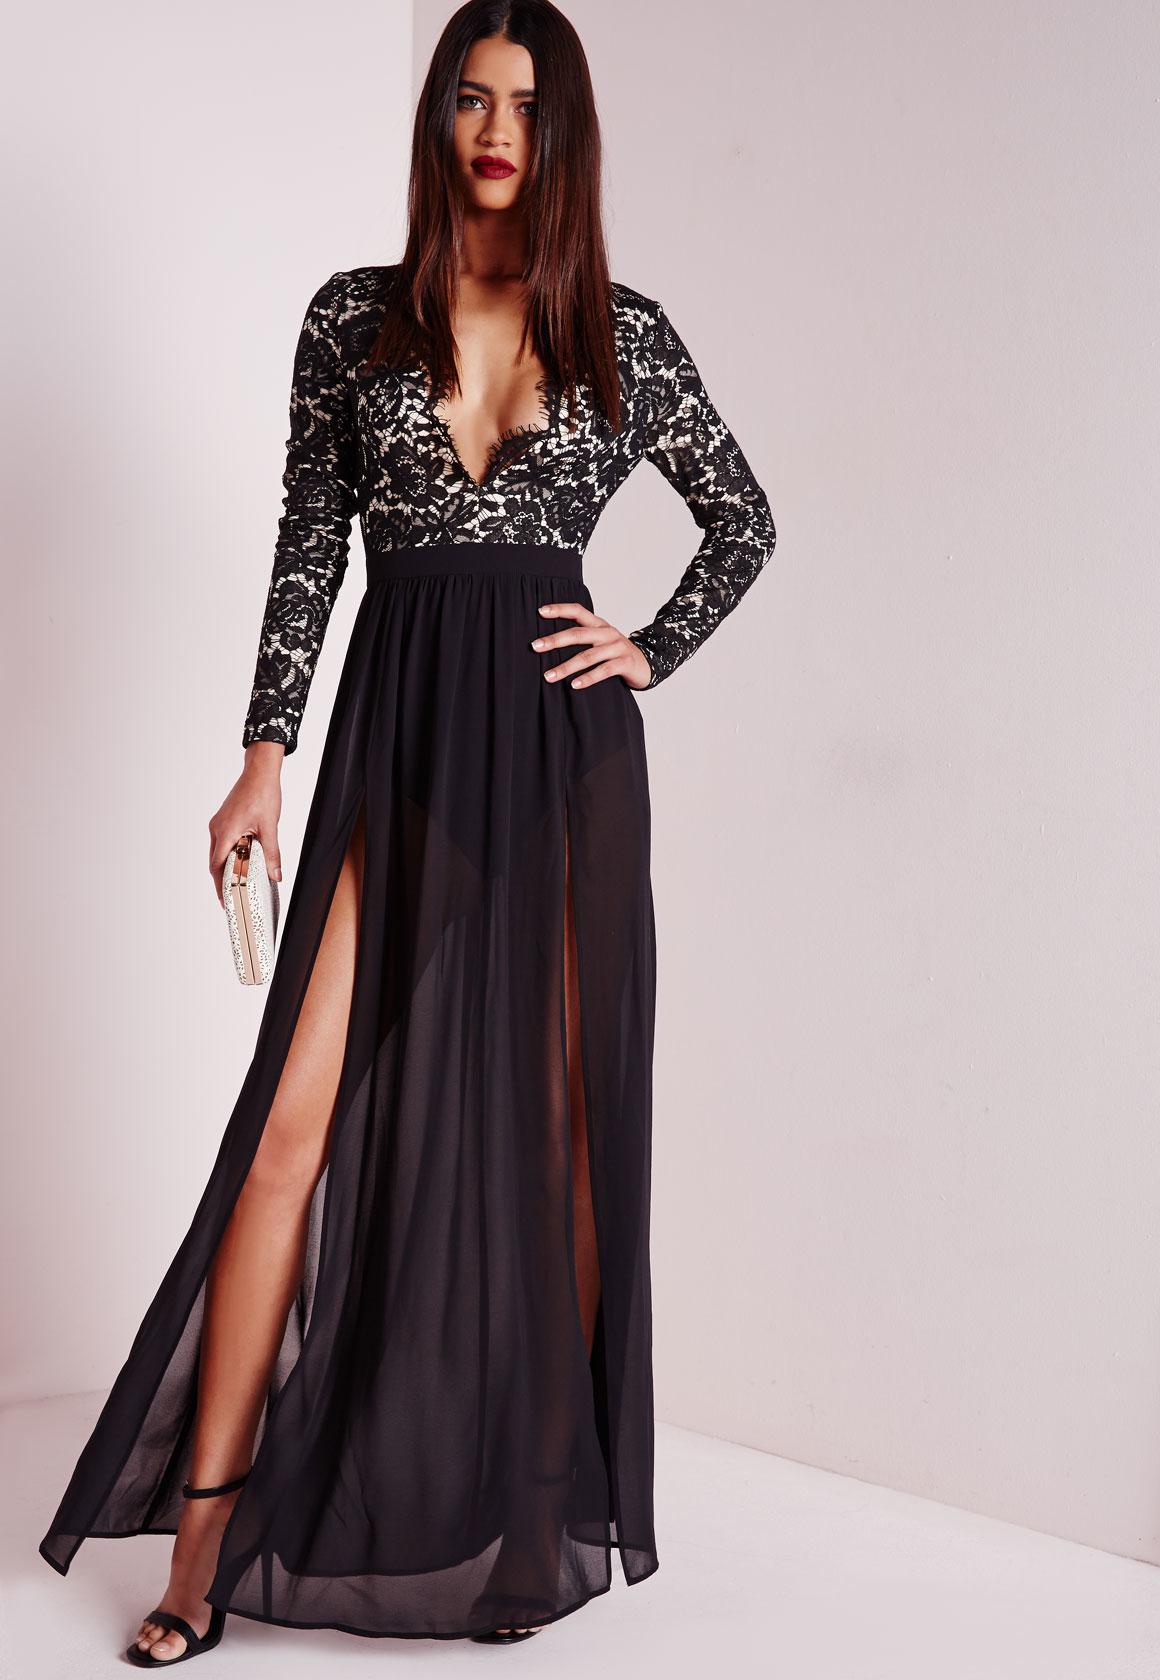 Scallop lace maxi dress